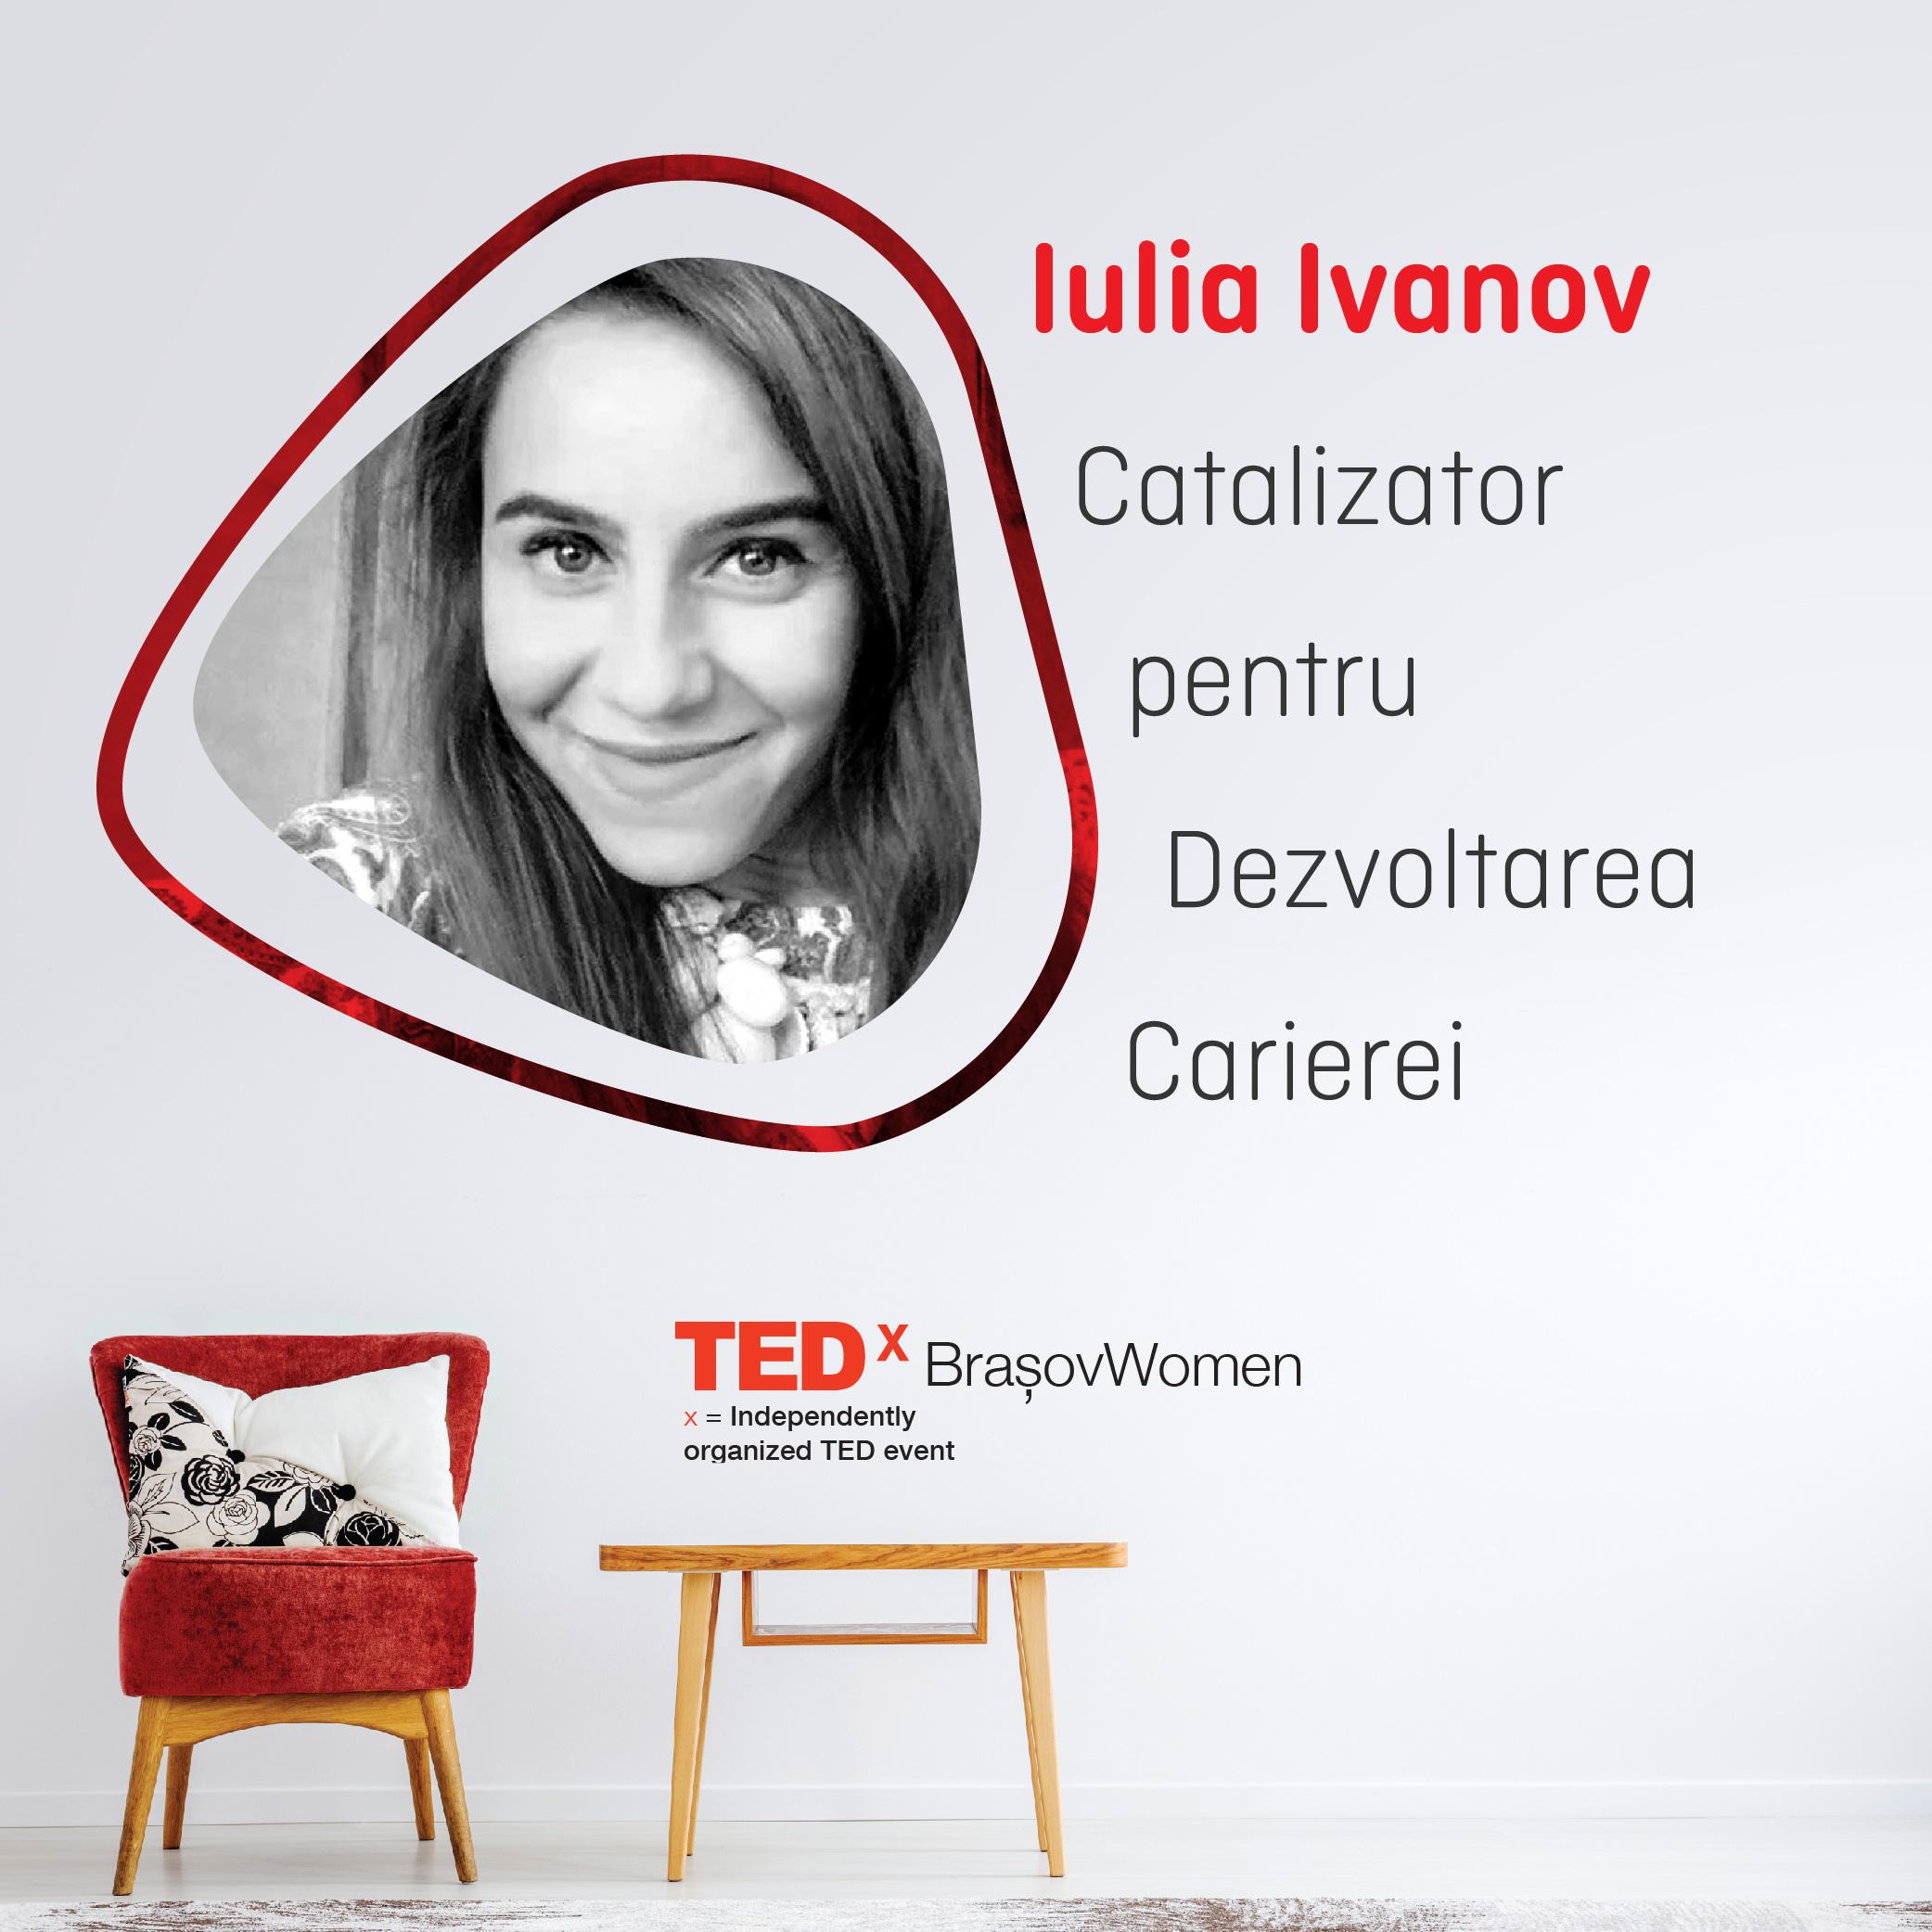 Iulia Ivanov